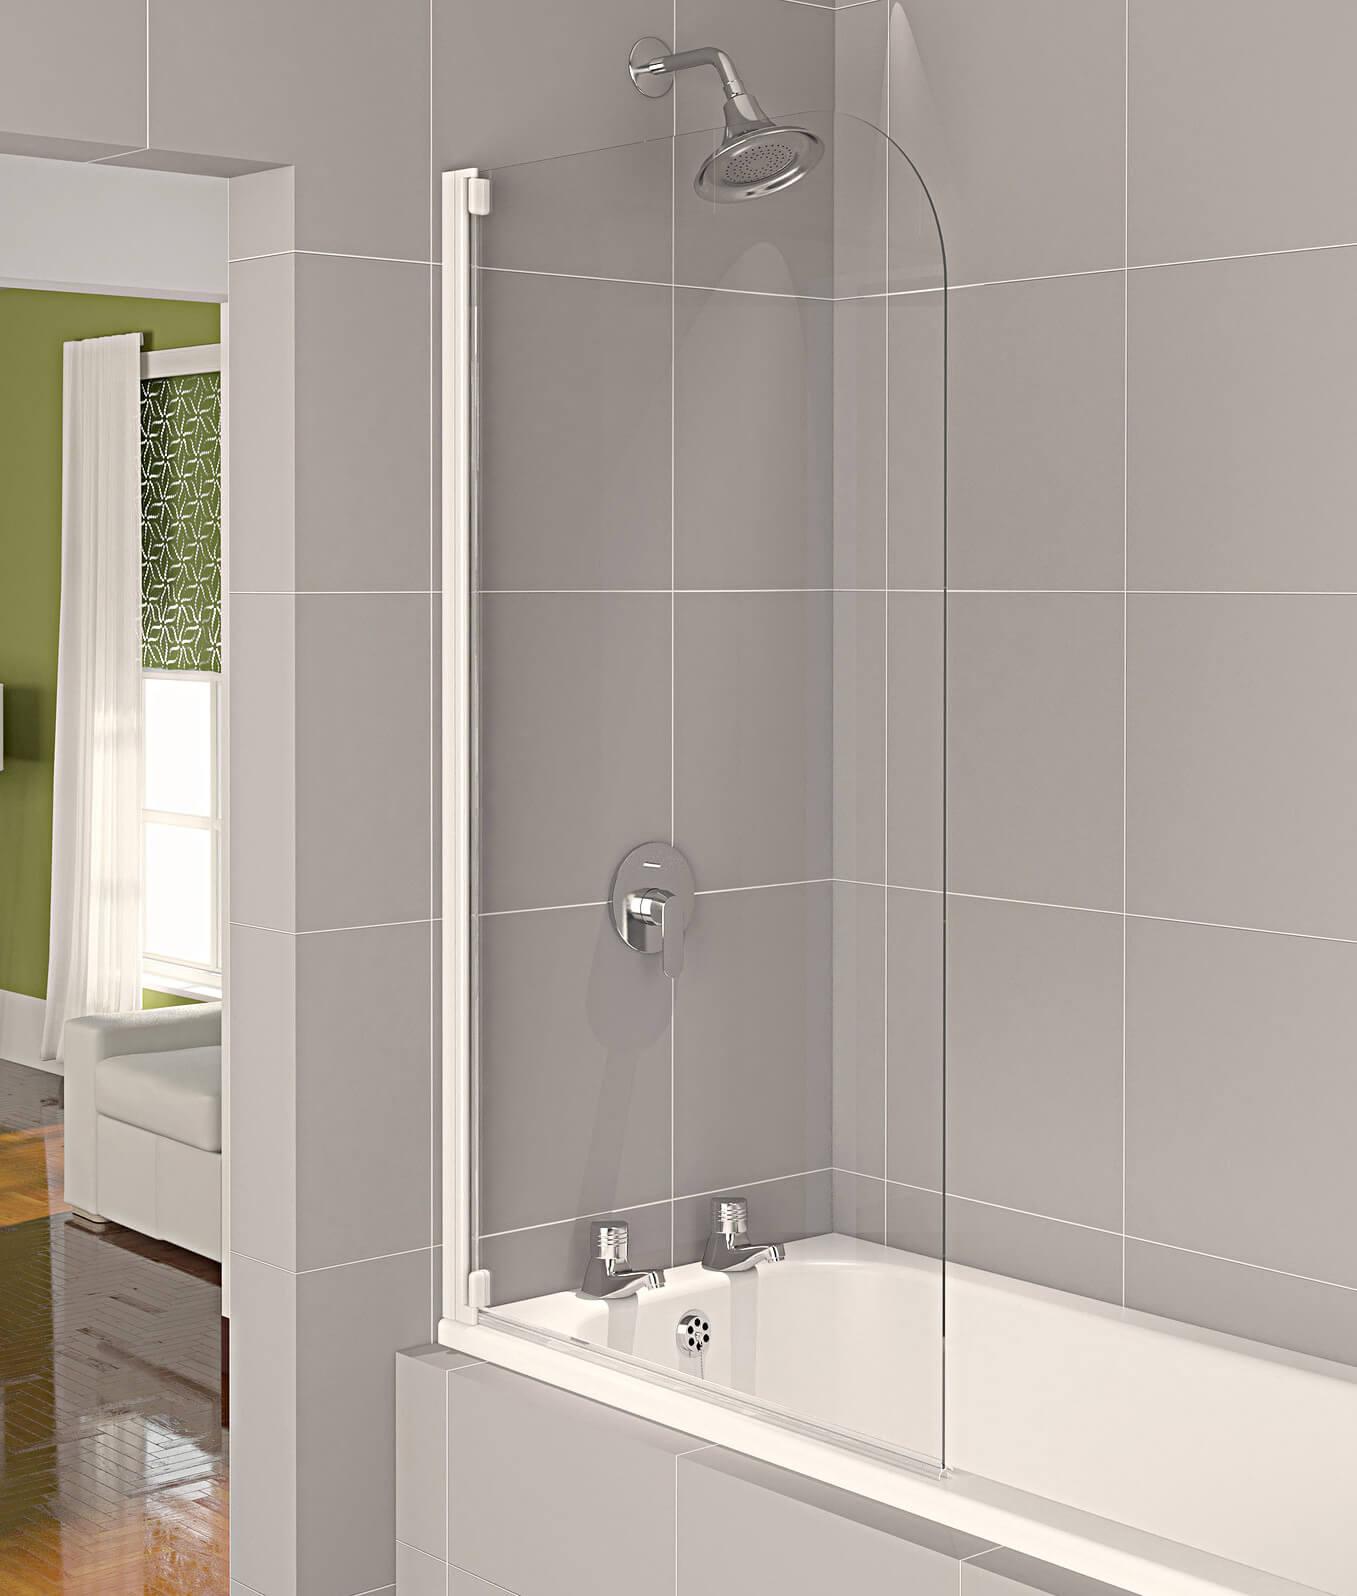 Aqualux Aqua 4 Half Frame 800mm Bath Screen White Clear